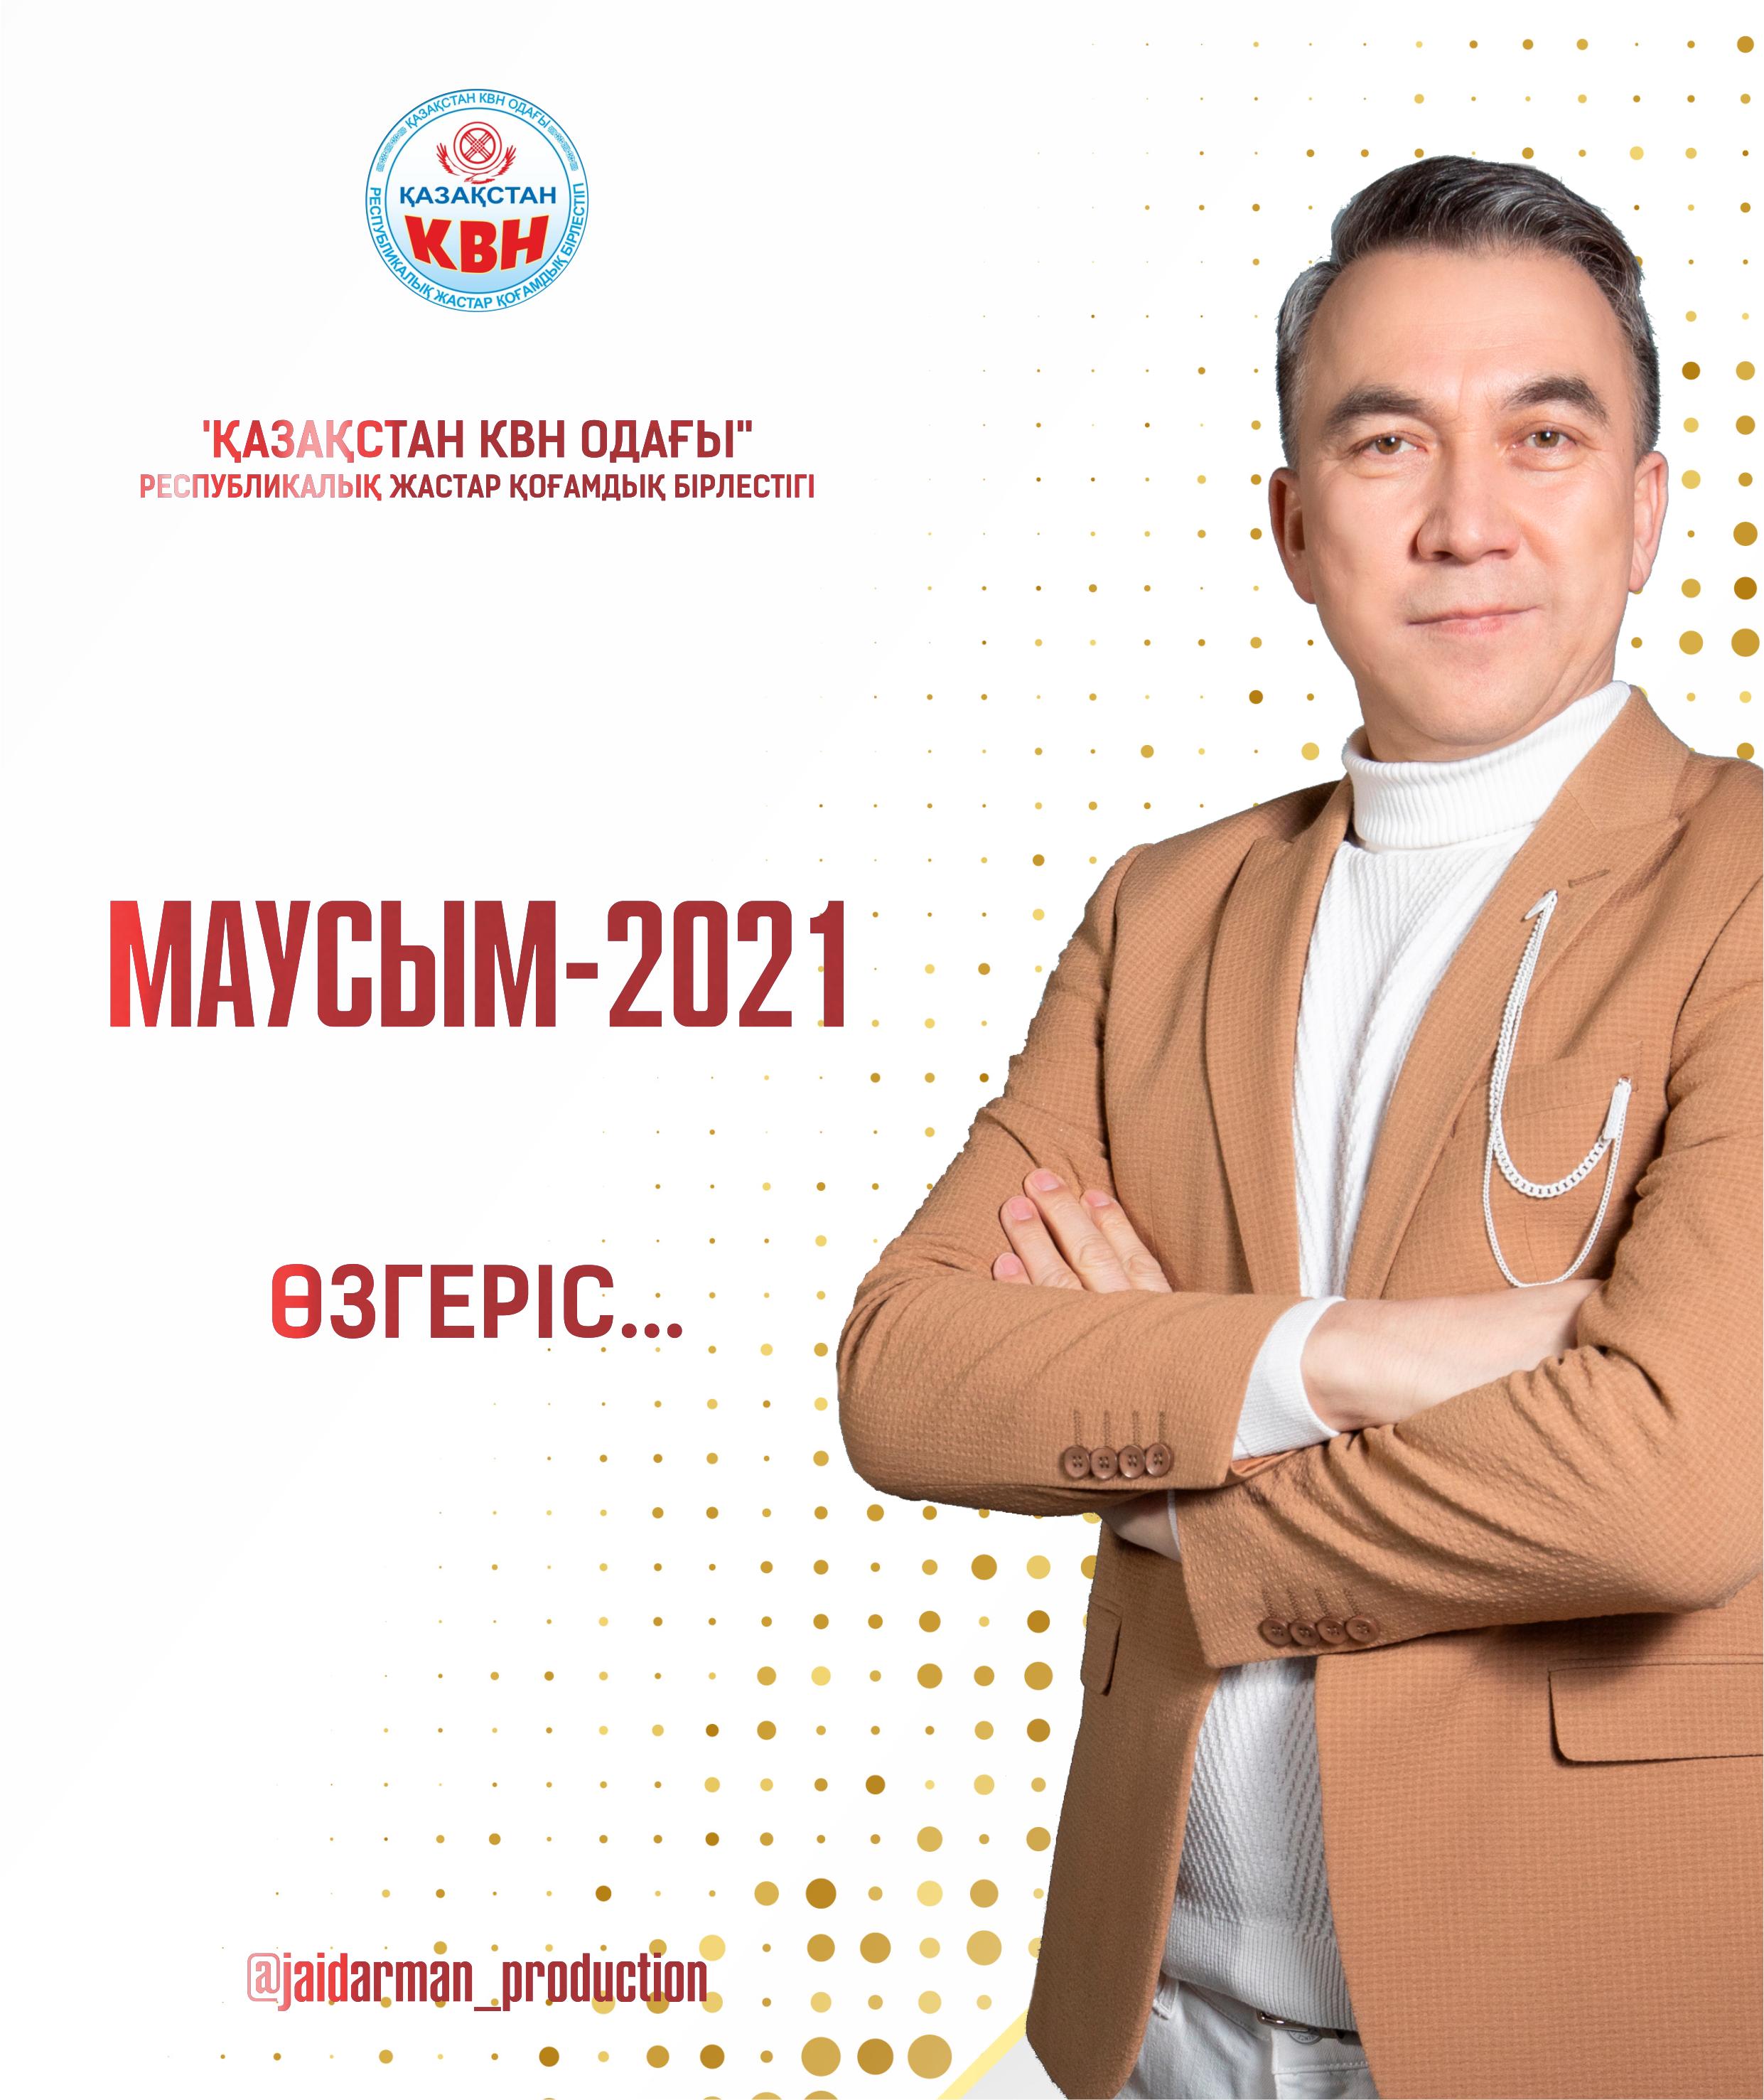 Маусым-2021